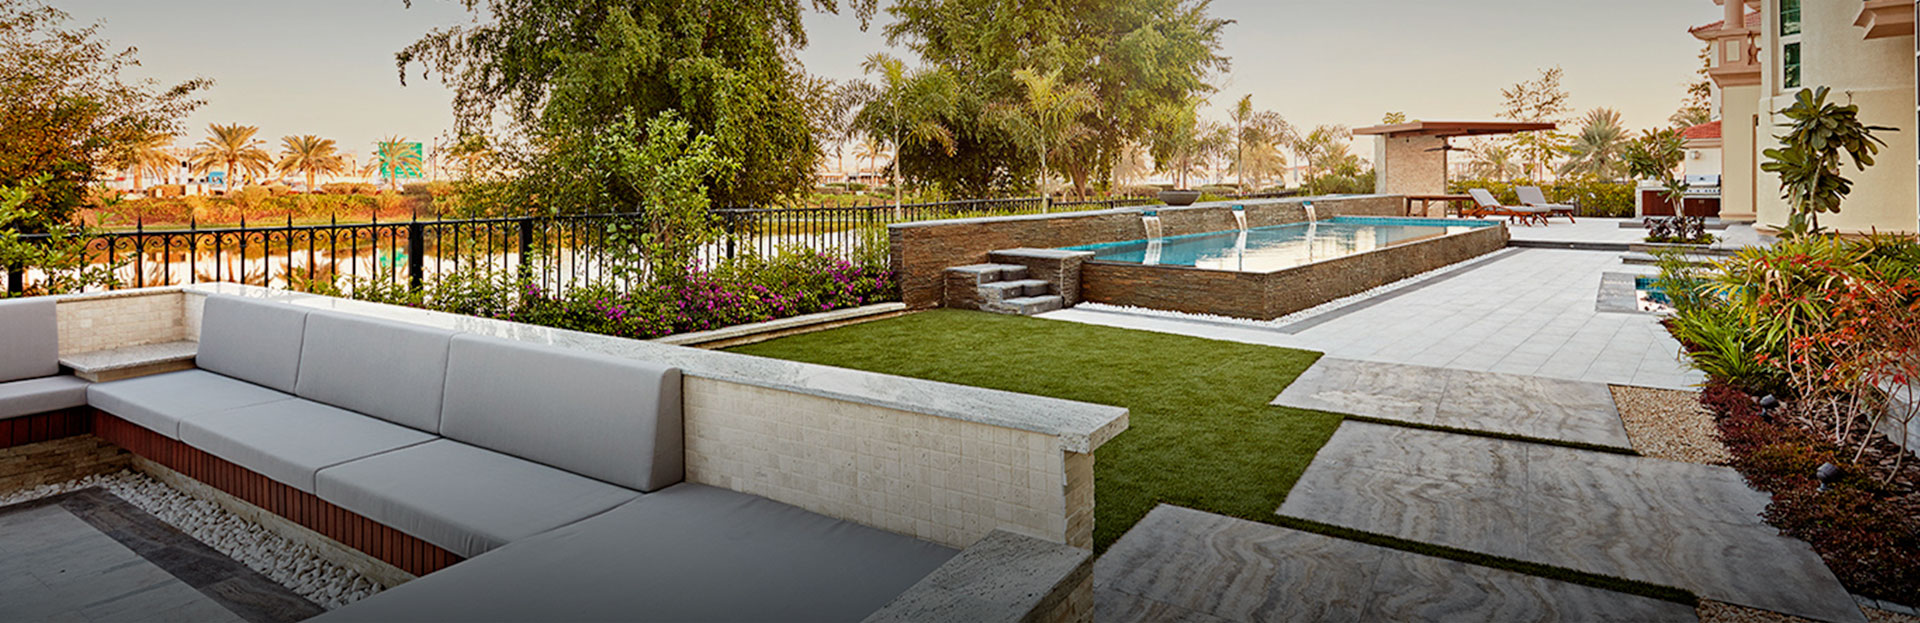 Landscape Designer Dubai  Landscape Design Company